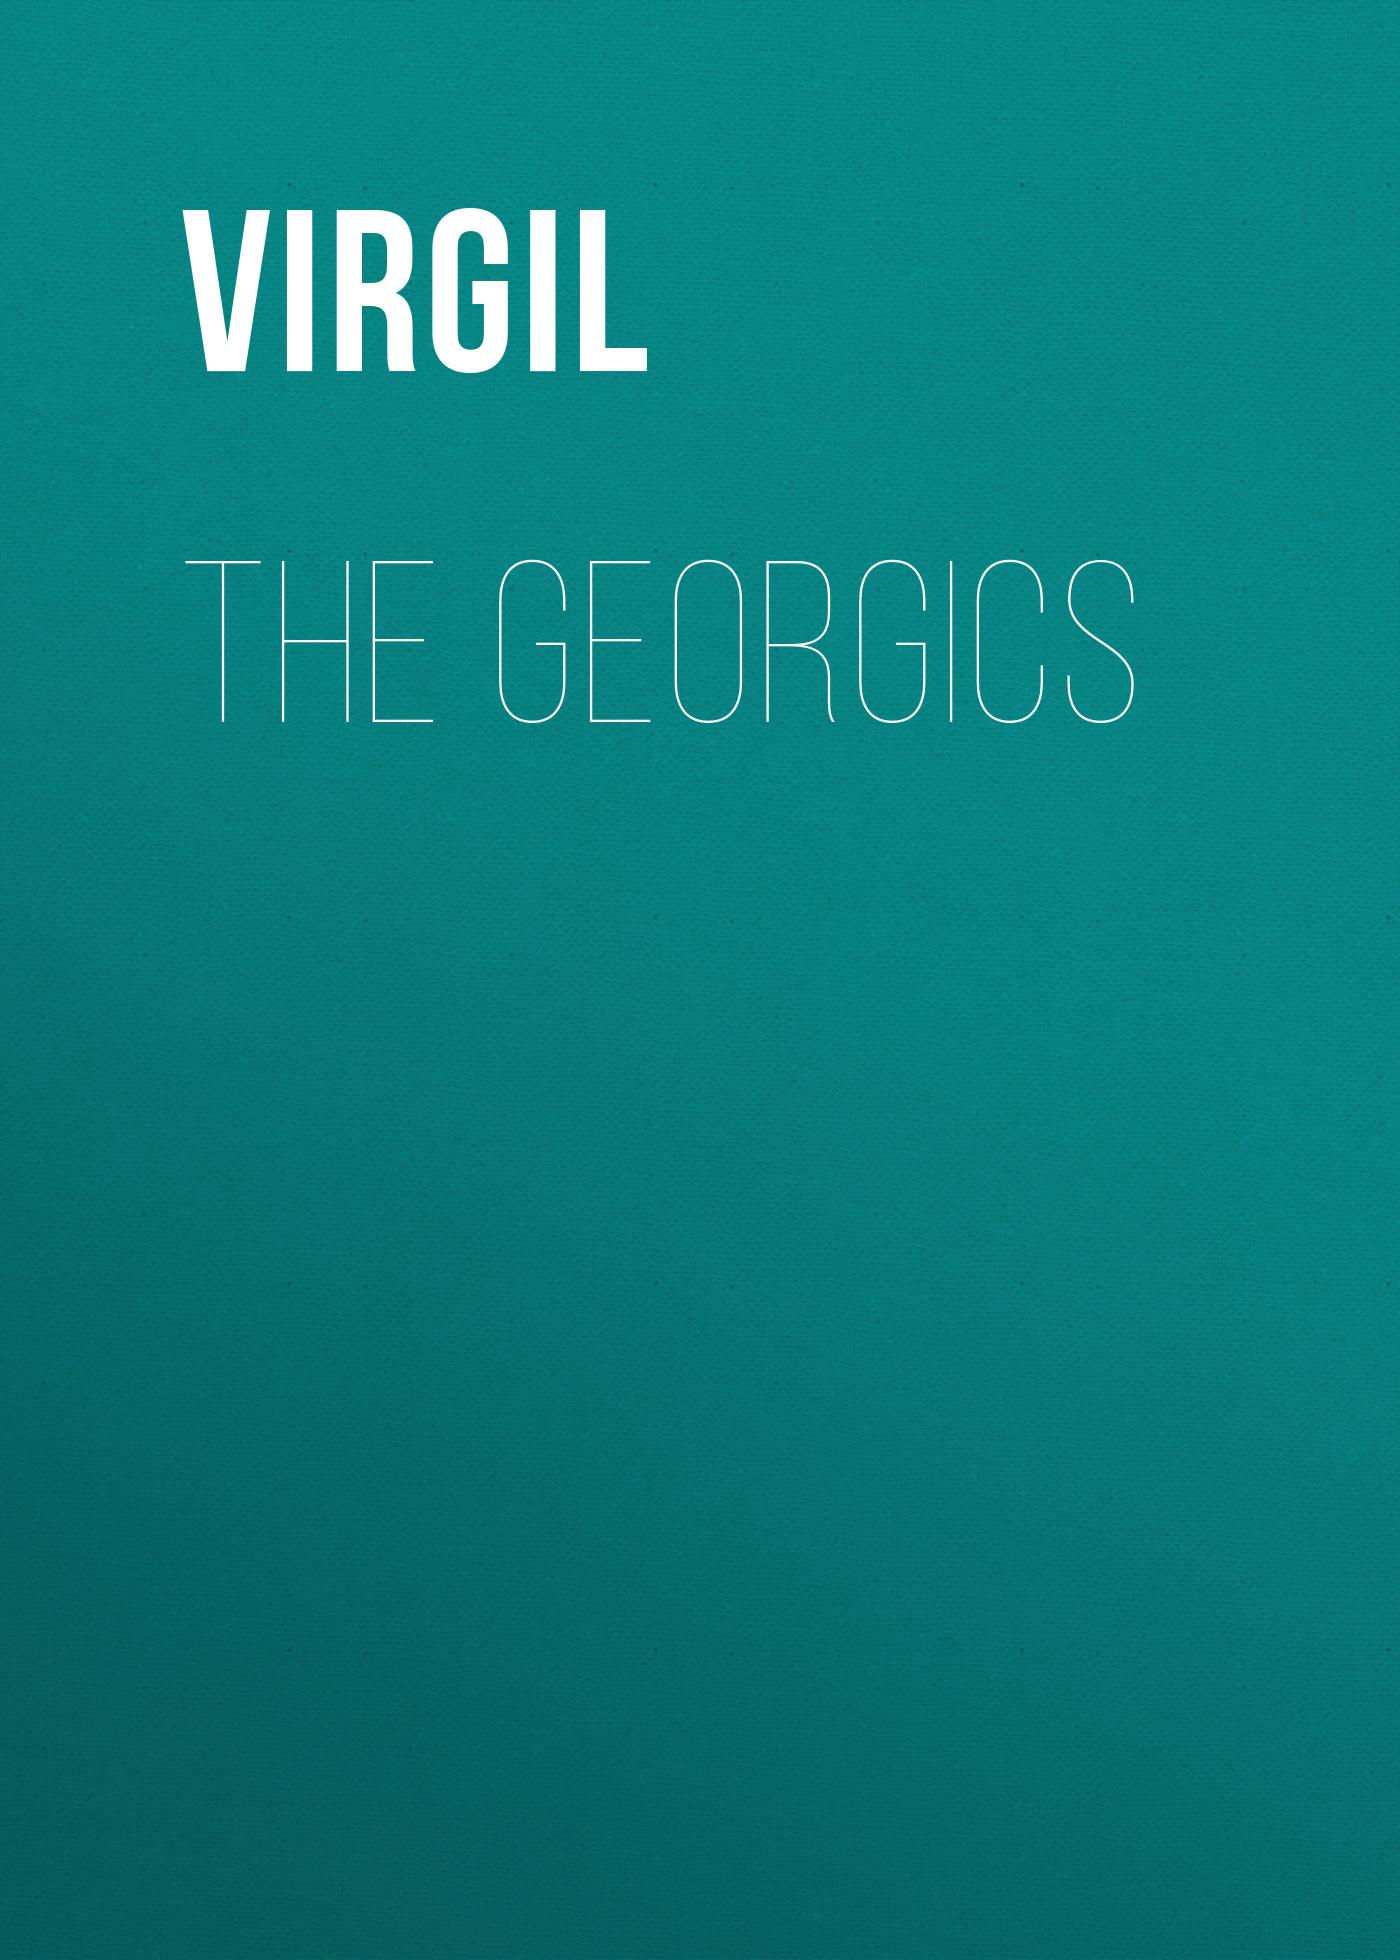 Virgil The Georgics